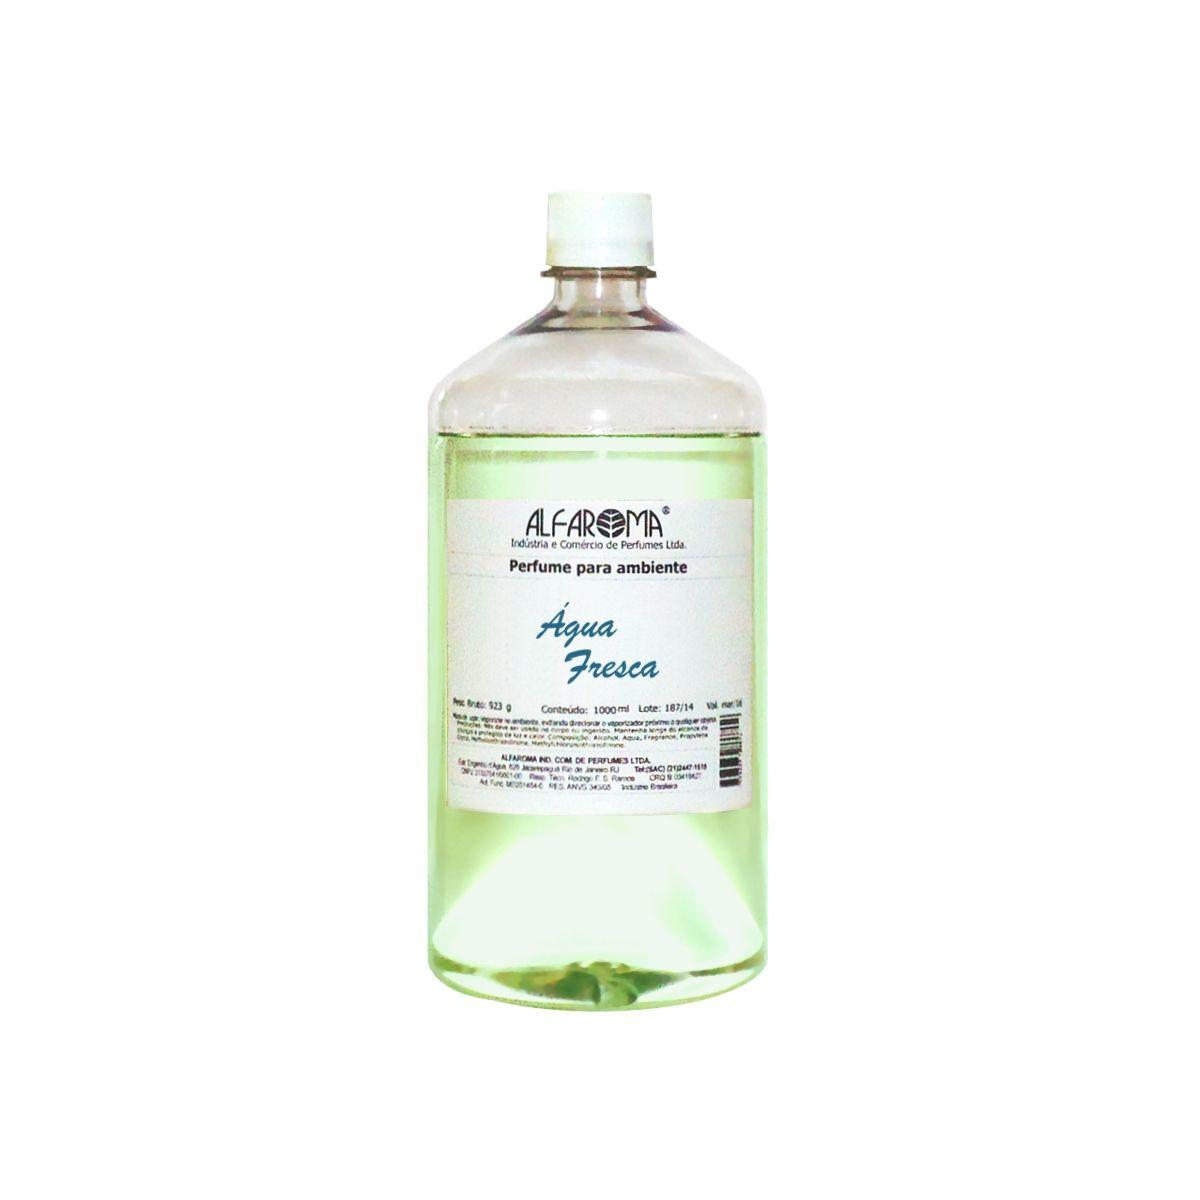 Perfume para ambiente Água Fresca